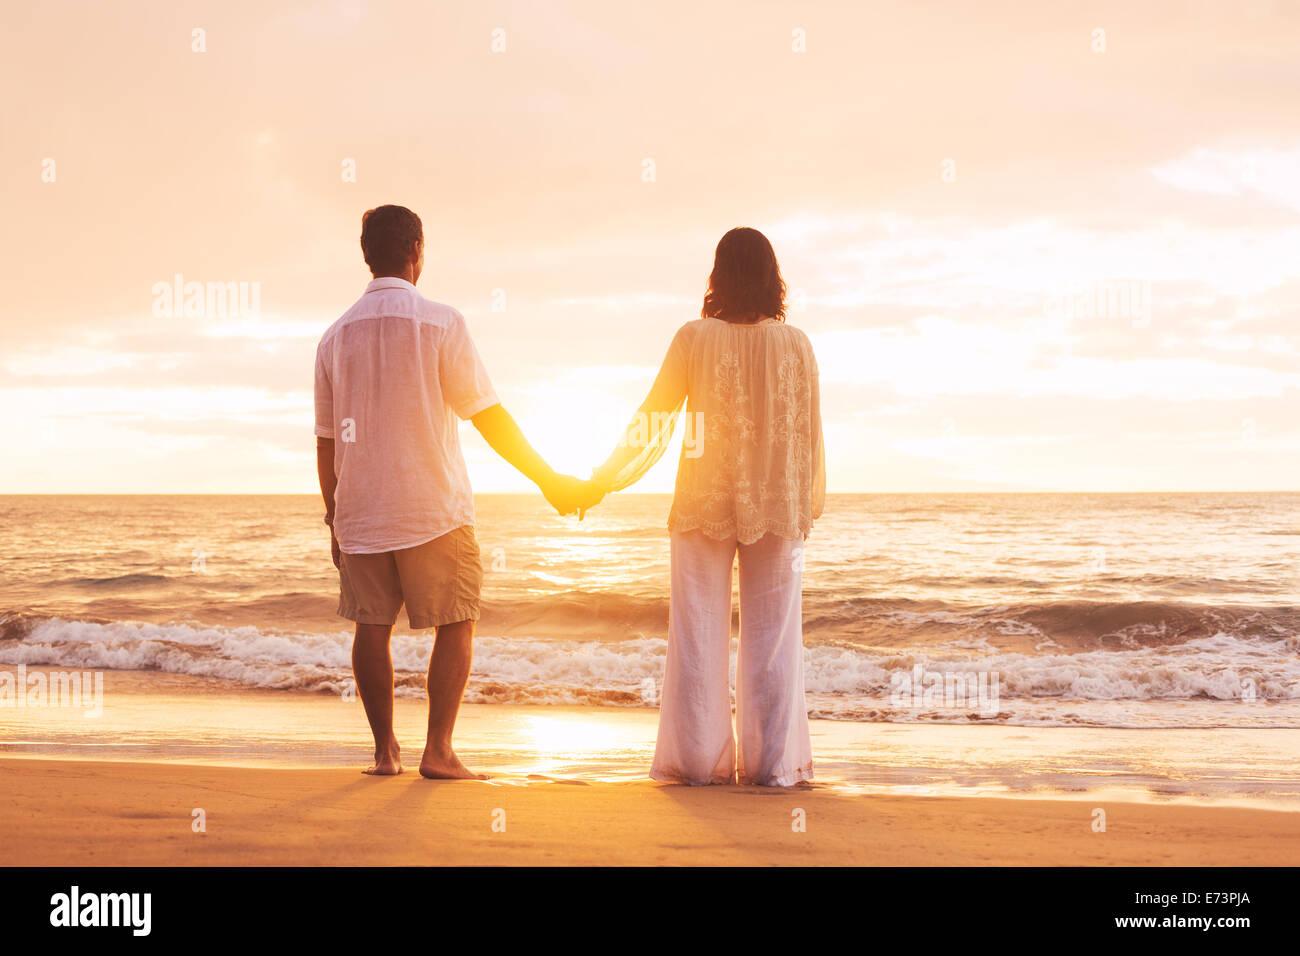 Romantische älteres paar Sonnenuntergang am Strand genießen Stockbild